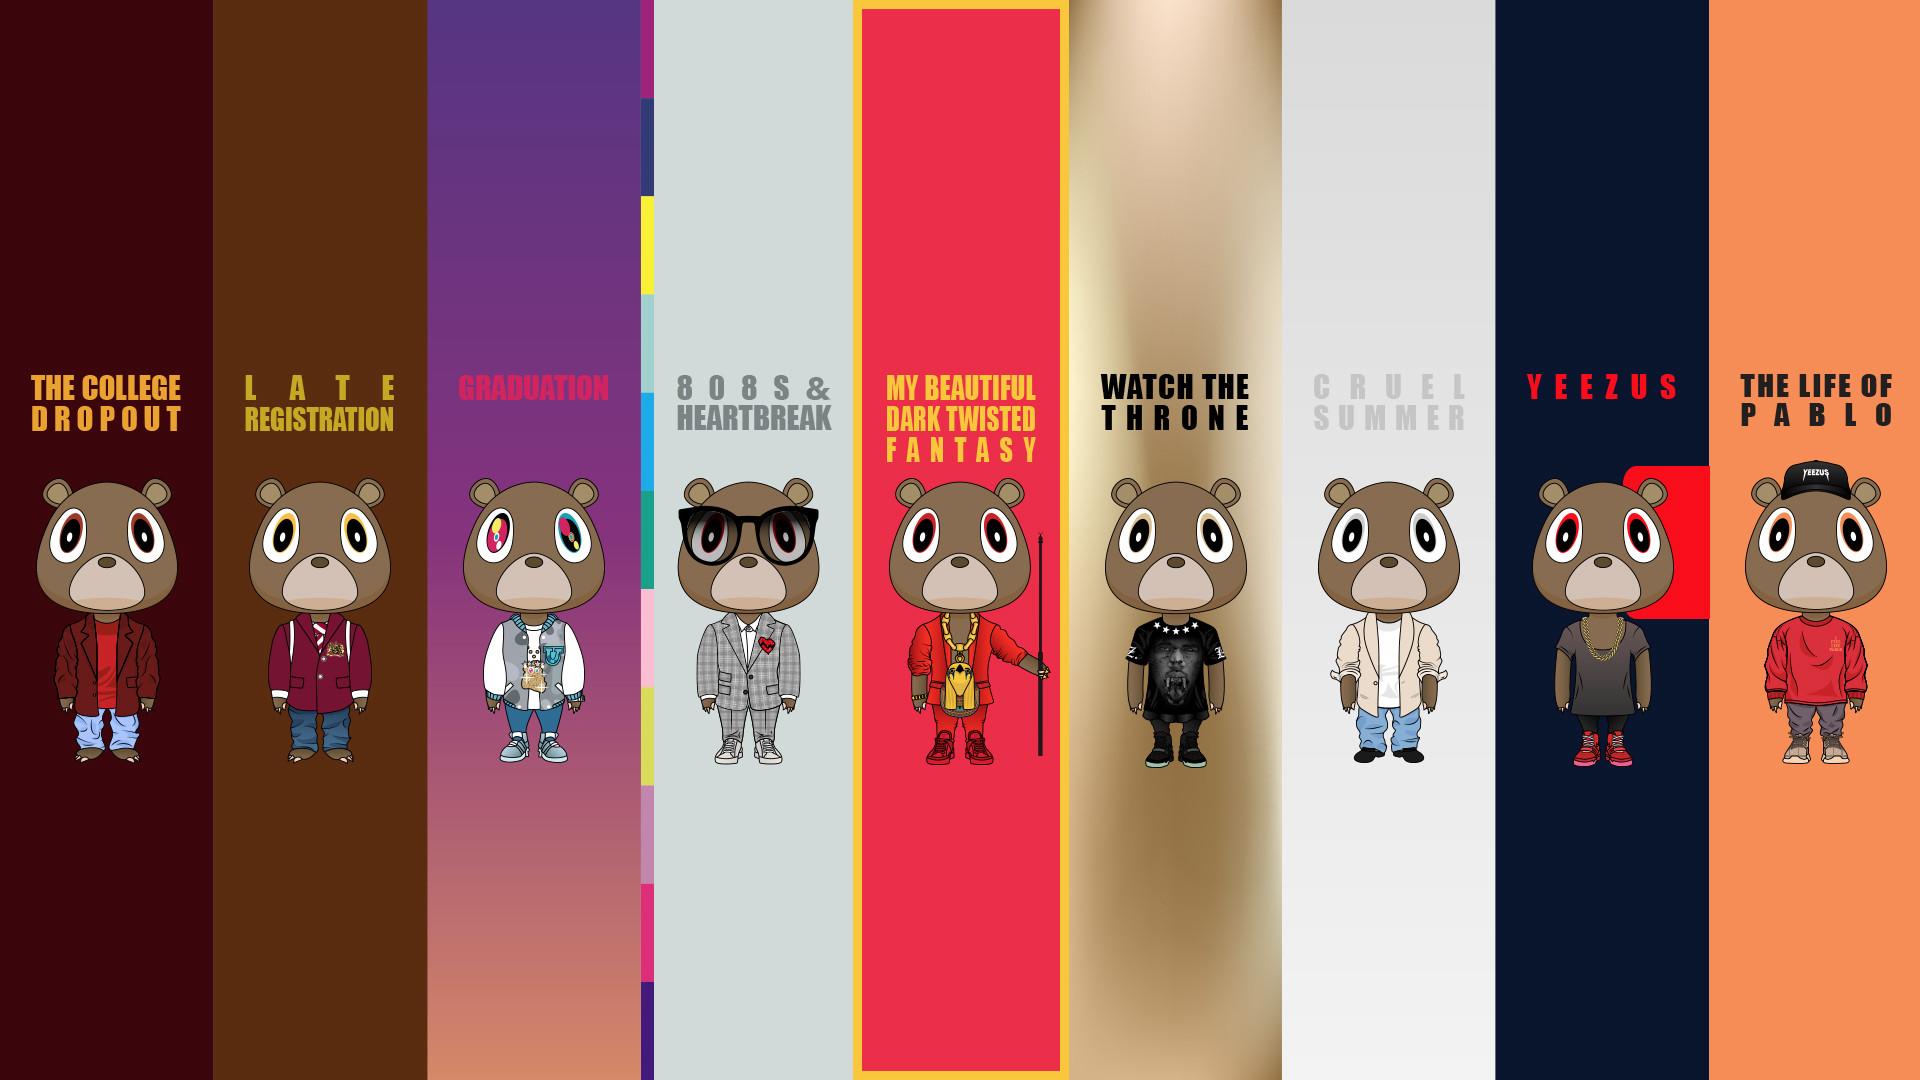 Kanye West Graduation Wallpaper